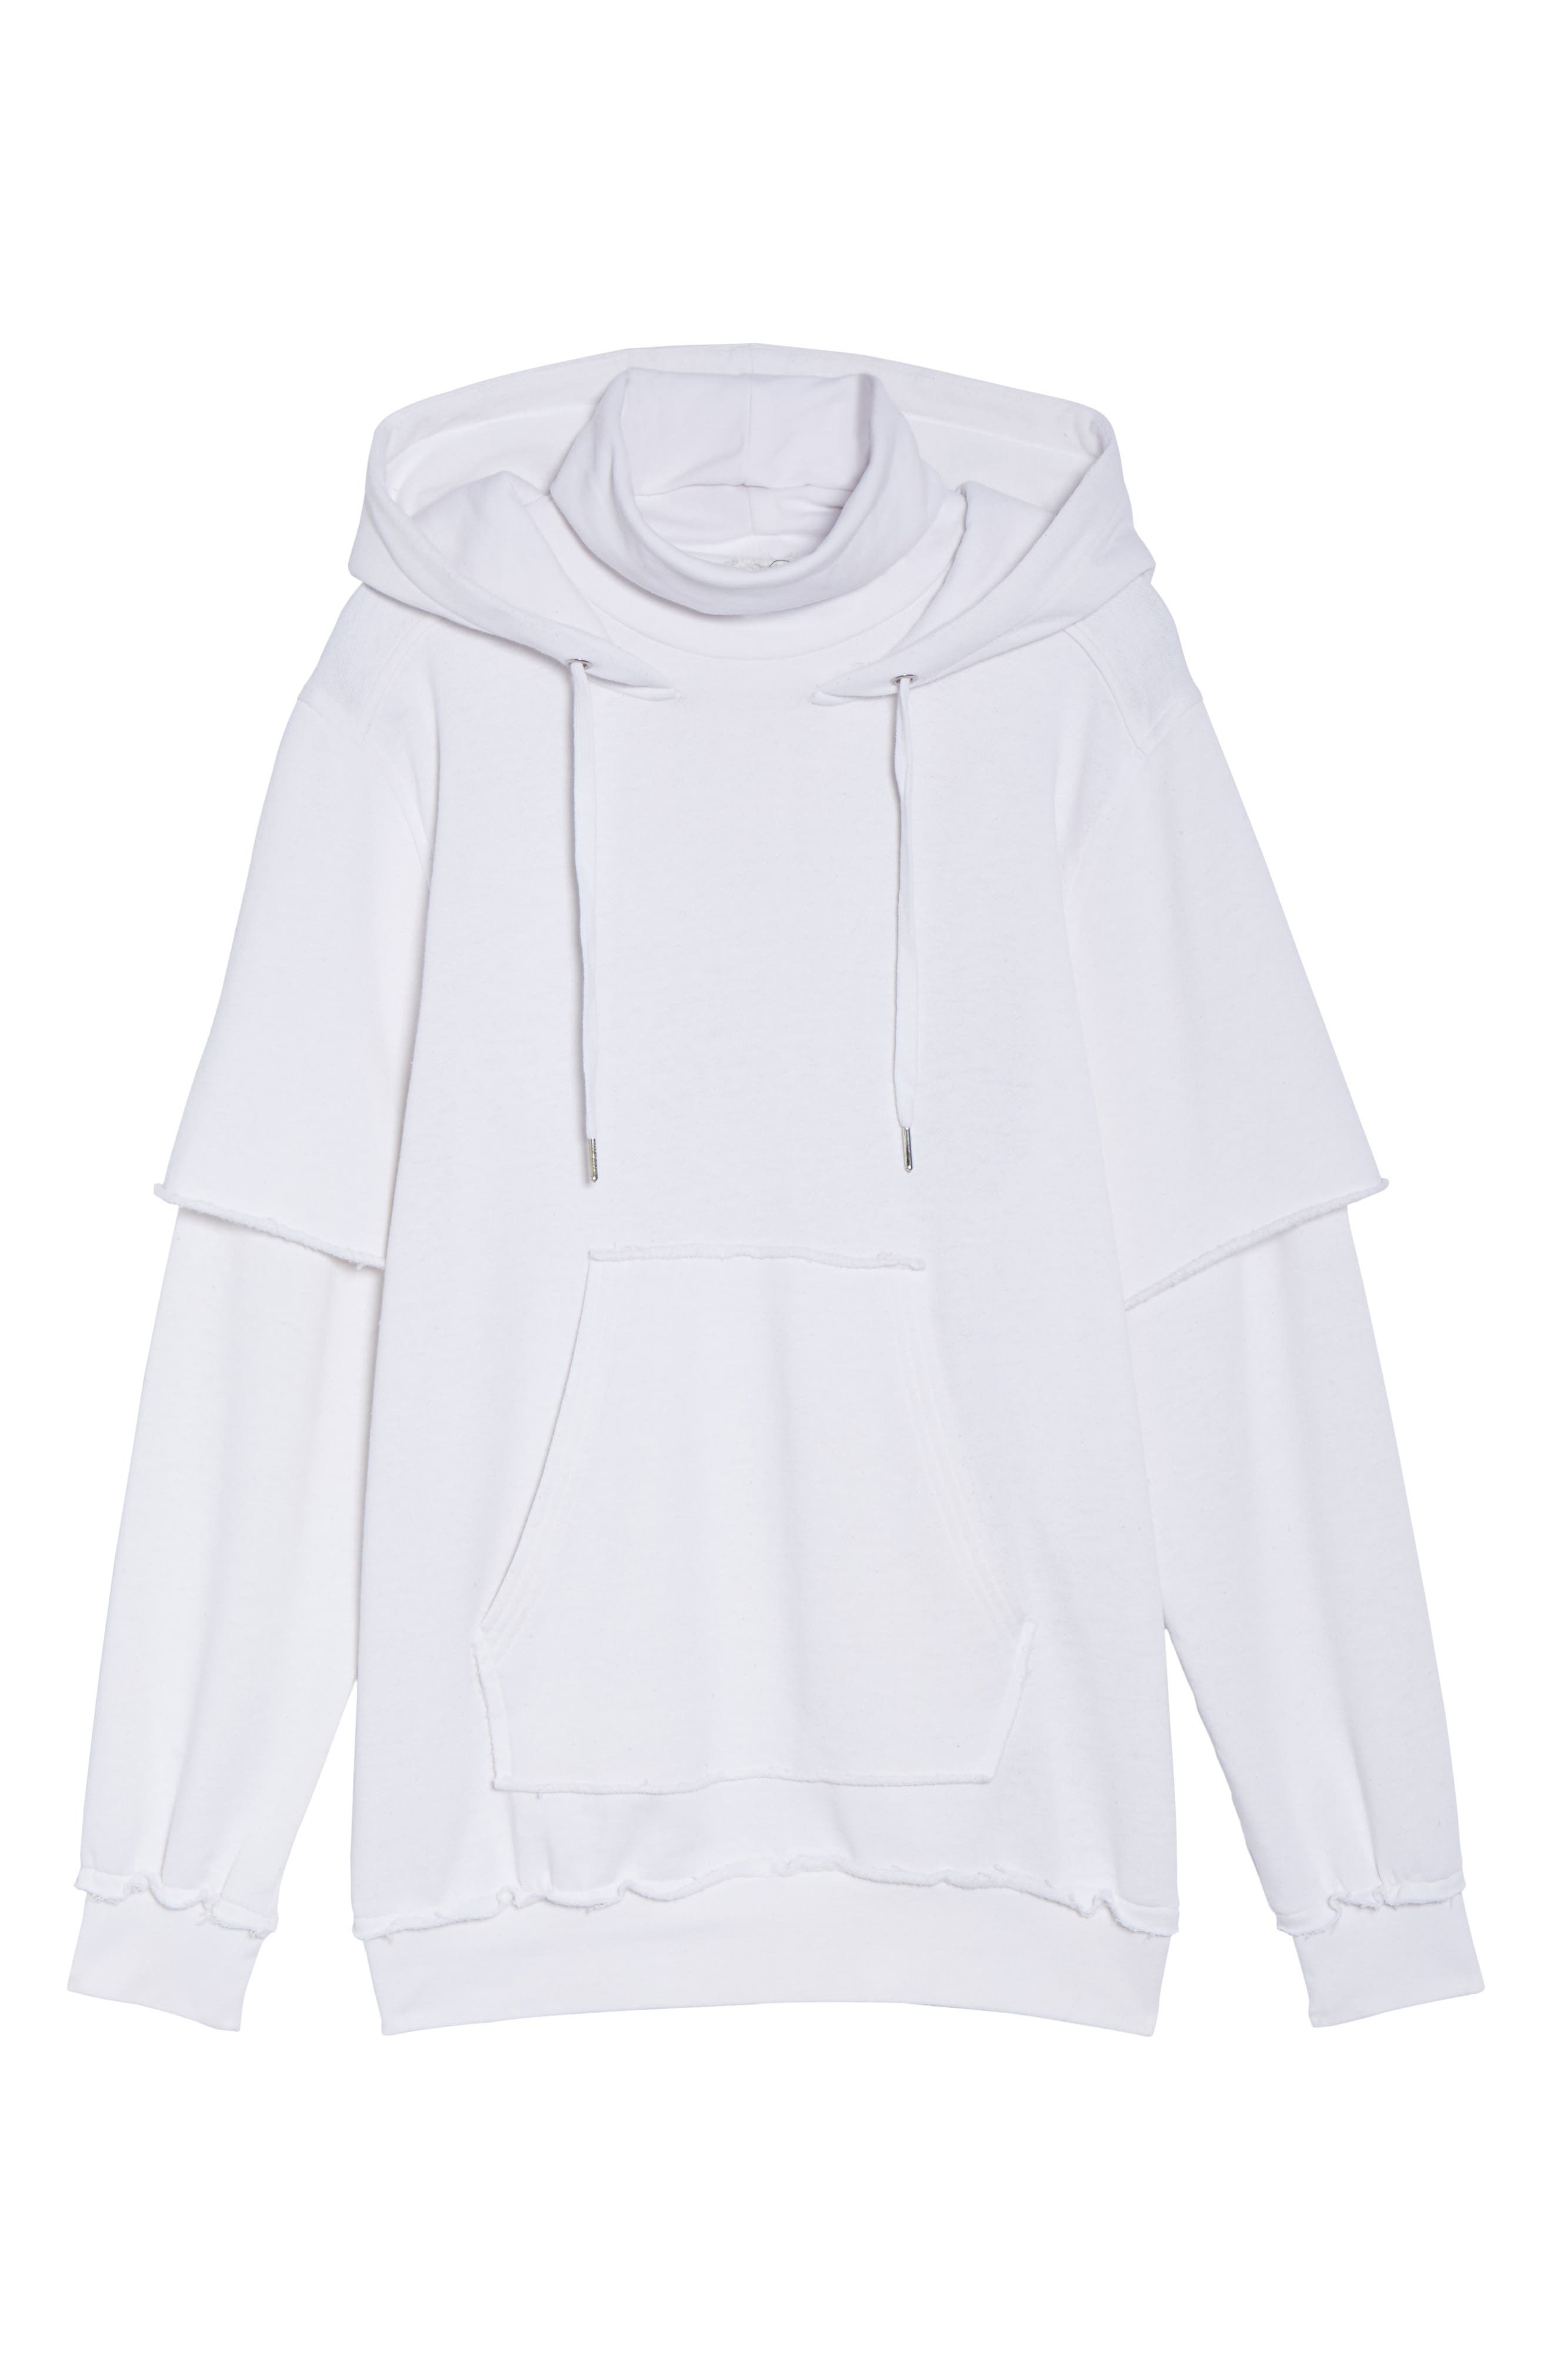 Good Hood Sweatshirt Dress,                             Alternate thumbnail 6, color,                             White